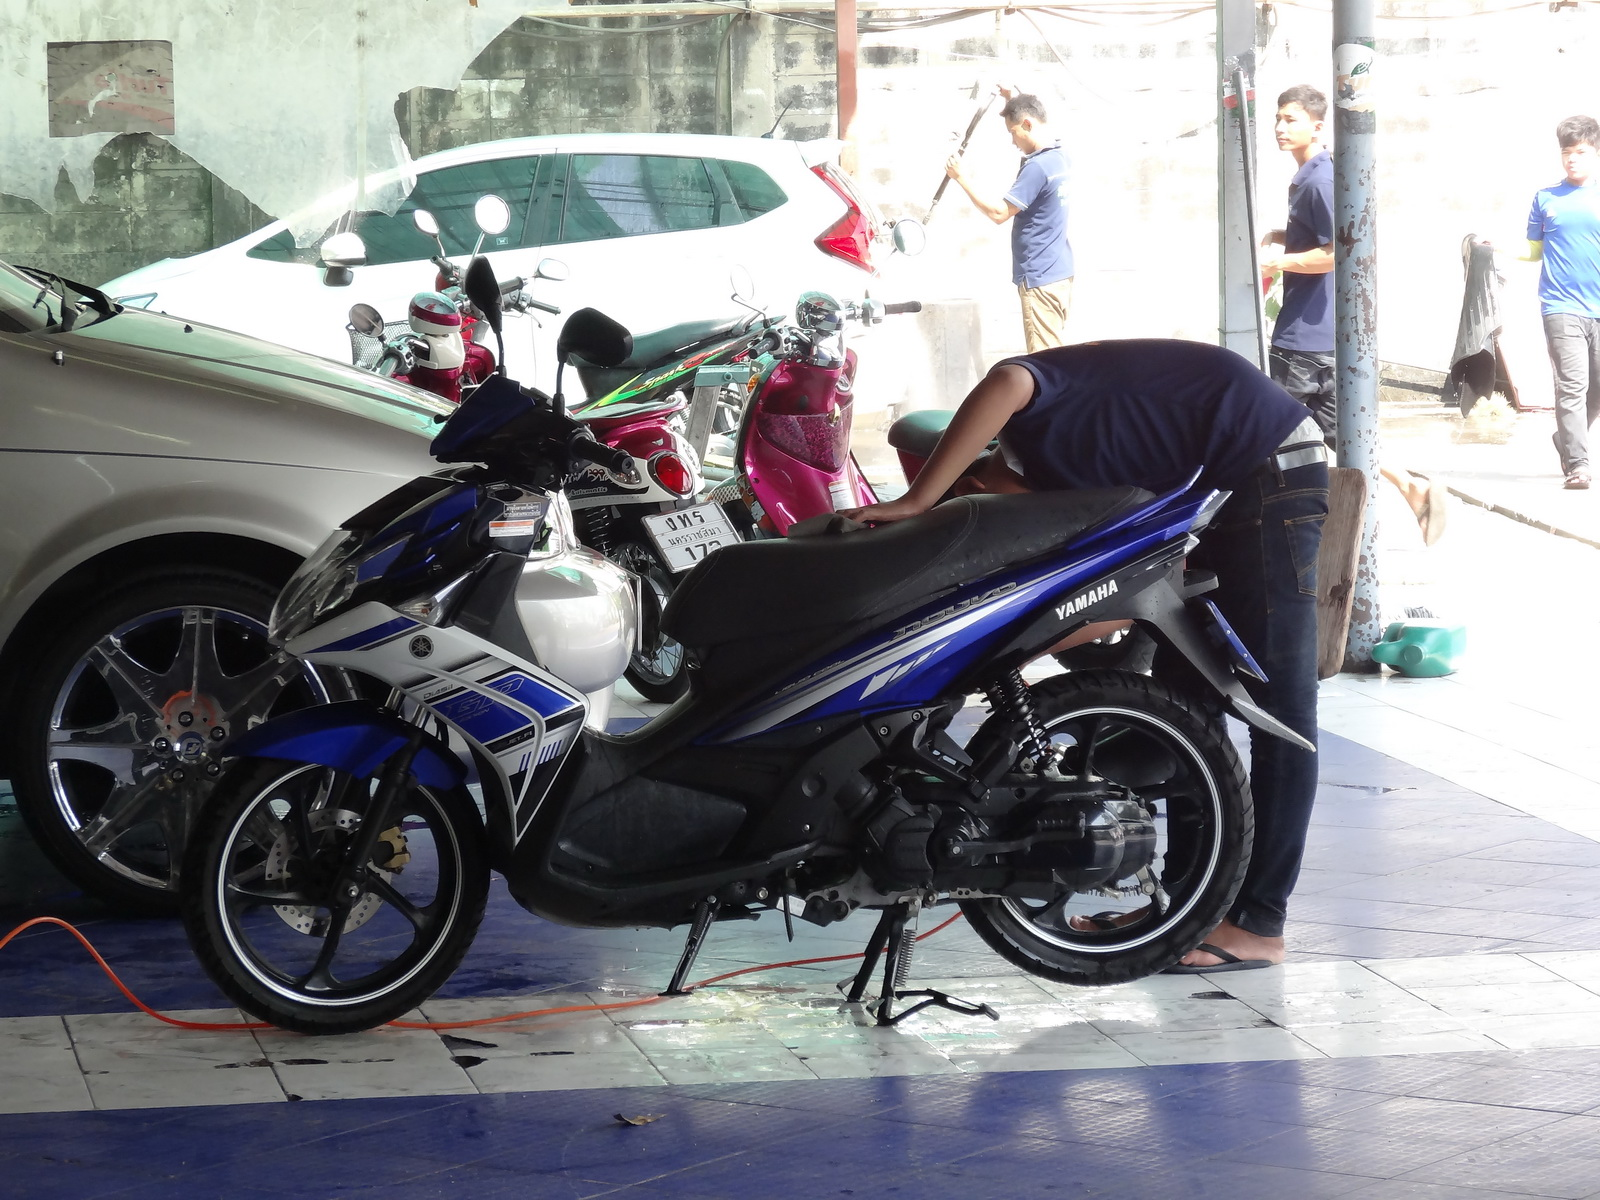 07 Pattaya 085